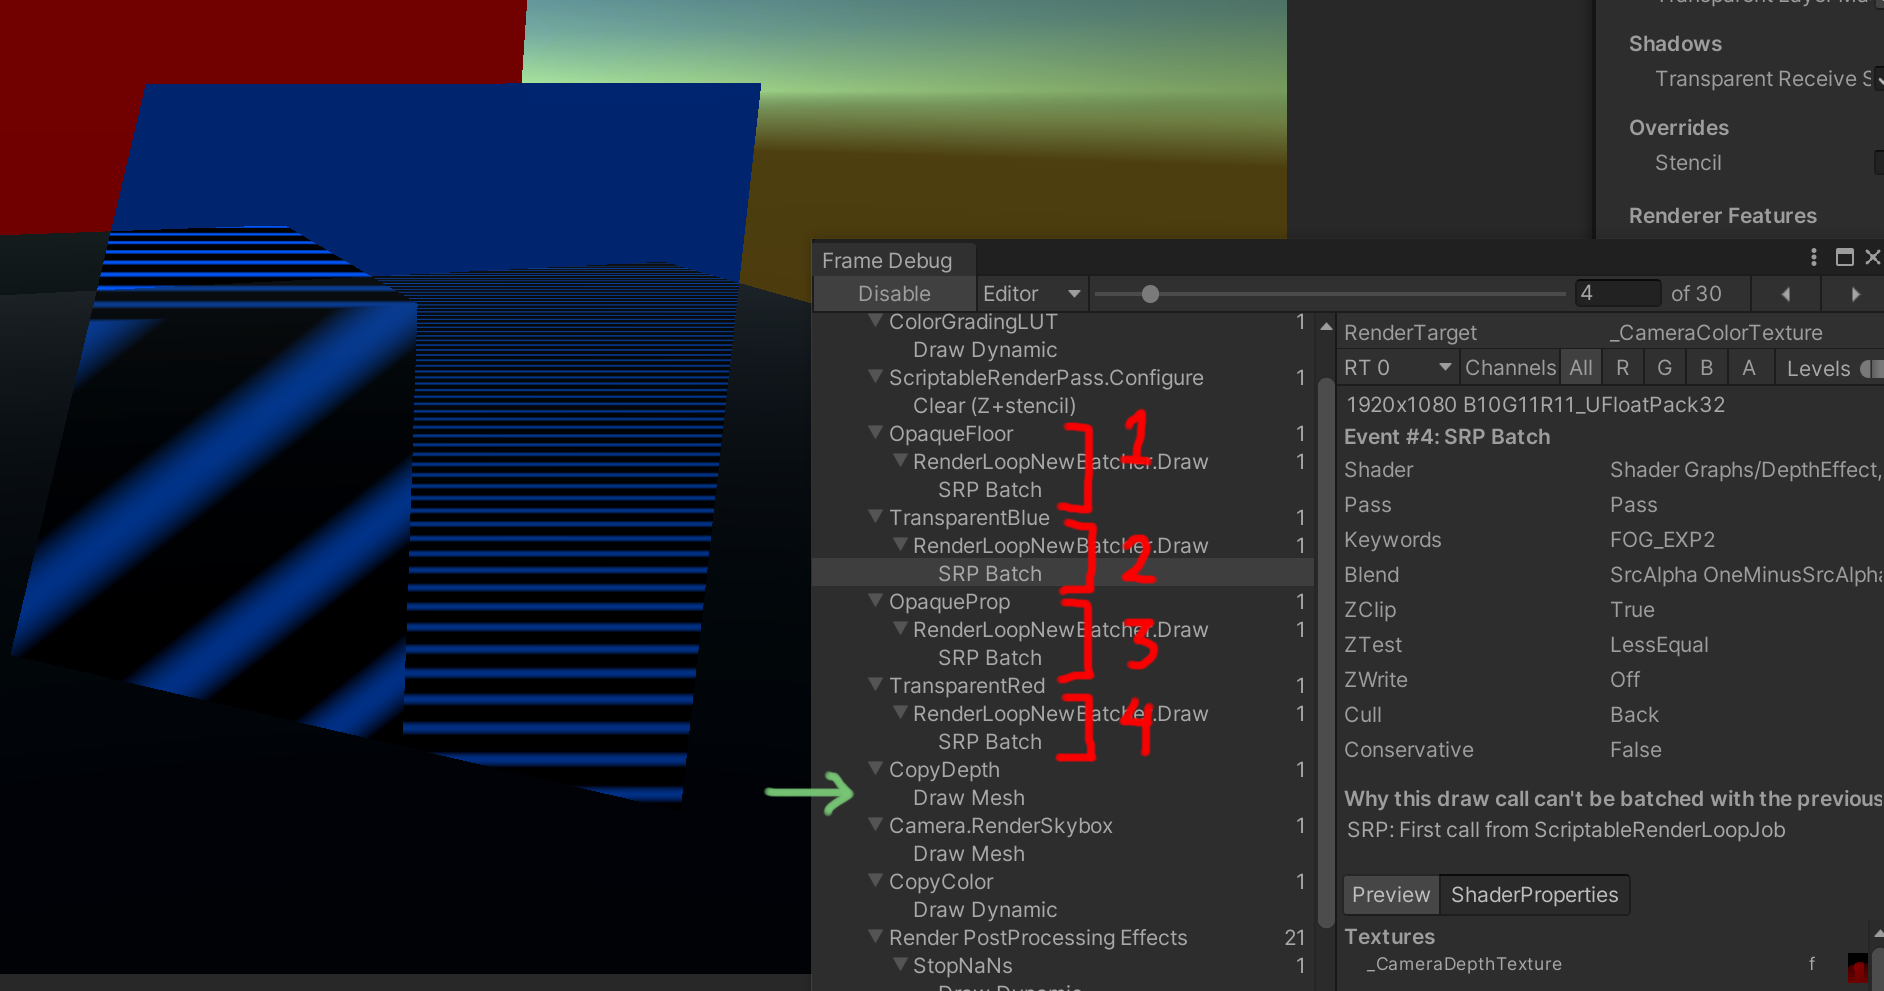 render_after_opaque_result.png